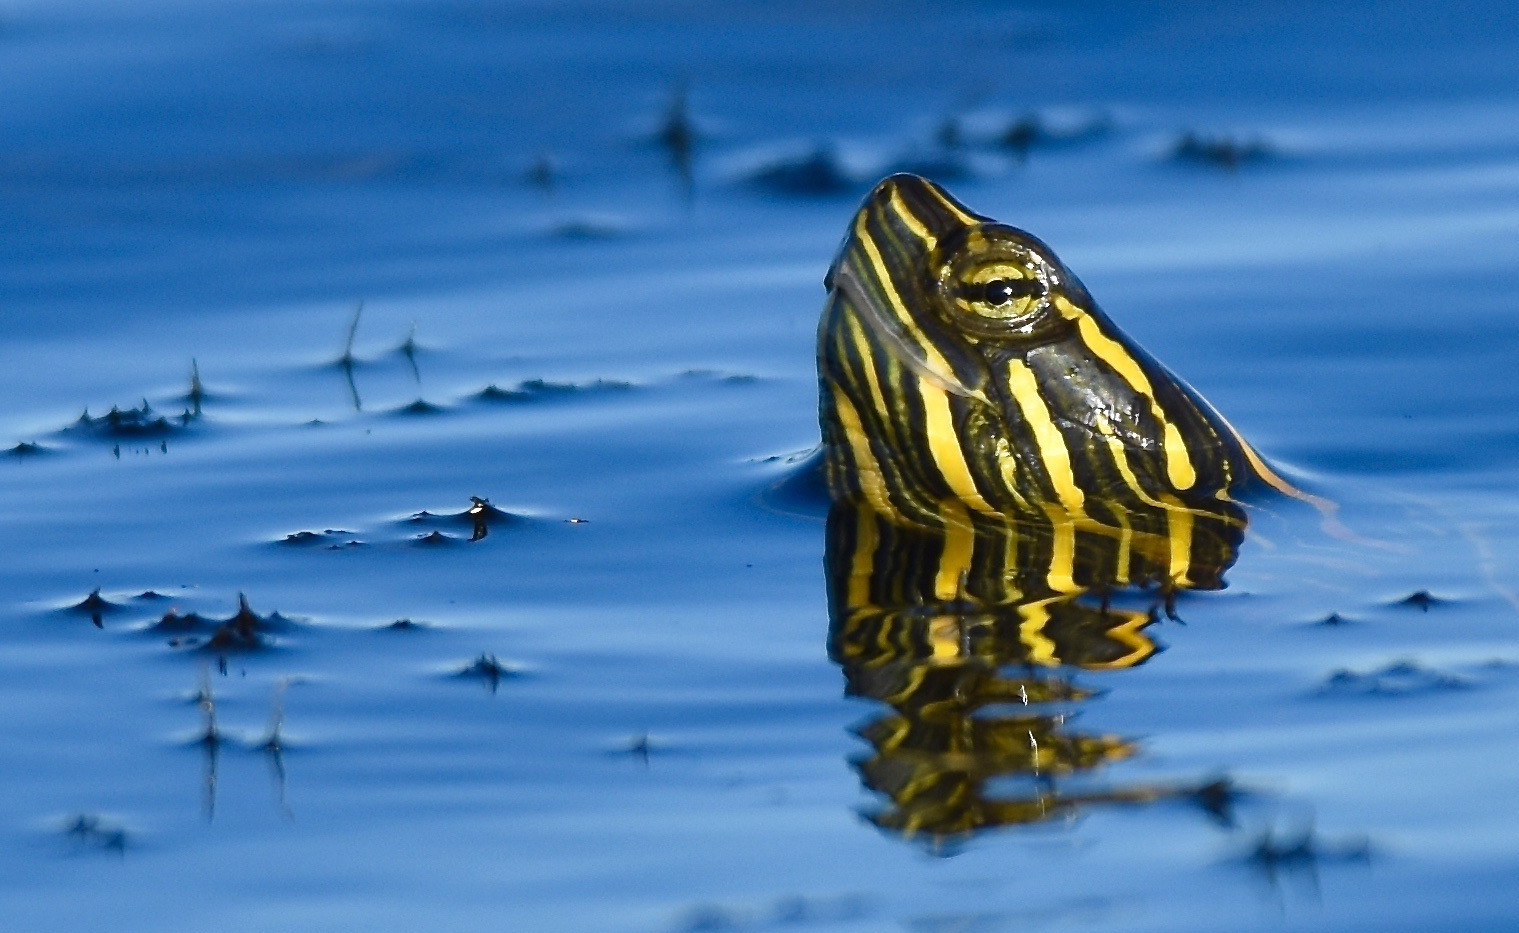 Turtle reflection on my birthday good lu